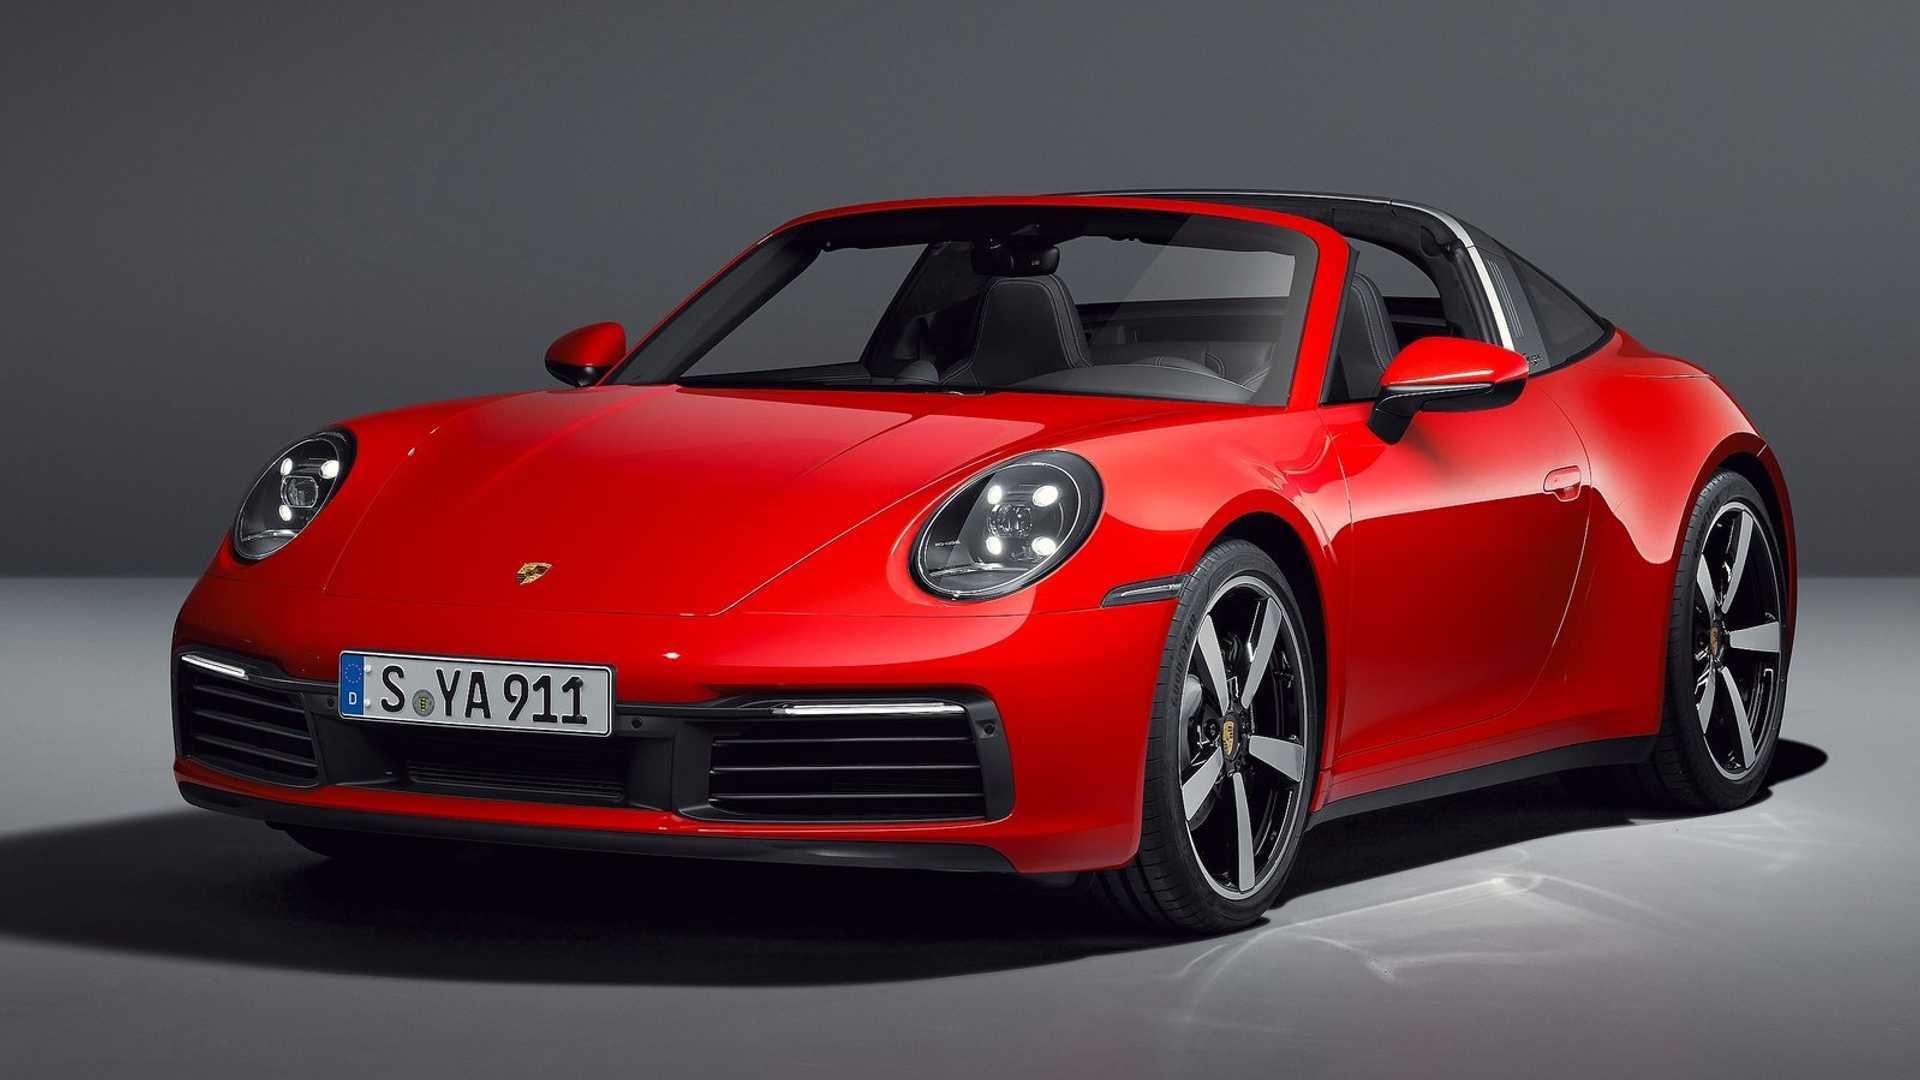 Novo Porsche 911 Targa Completa Linha Com Cambio Manual De 7 Marchas